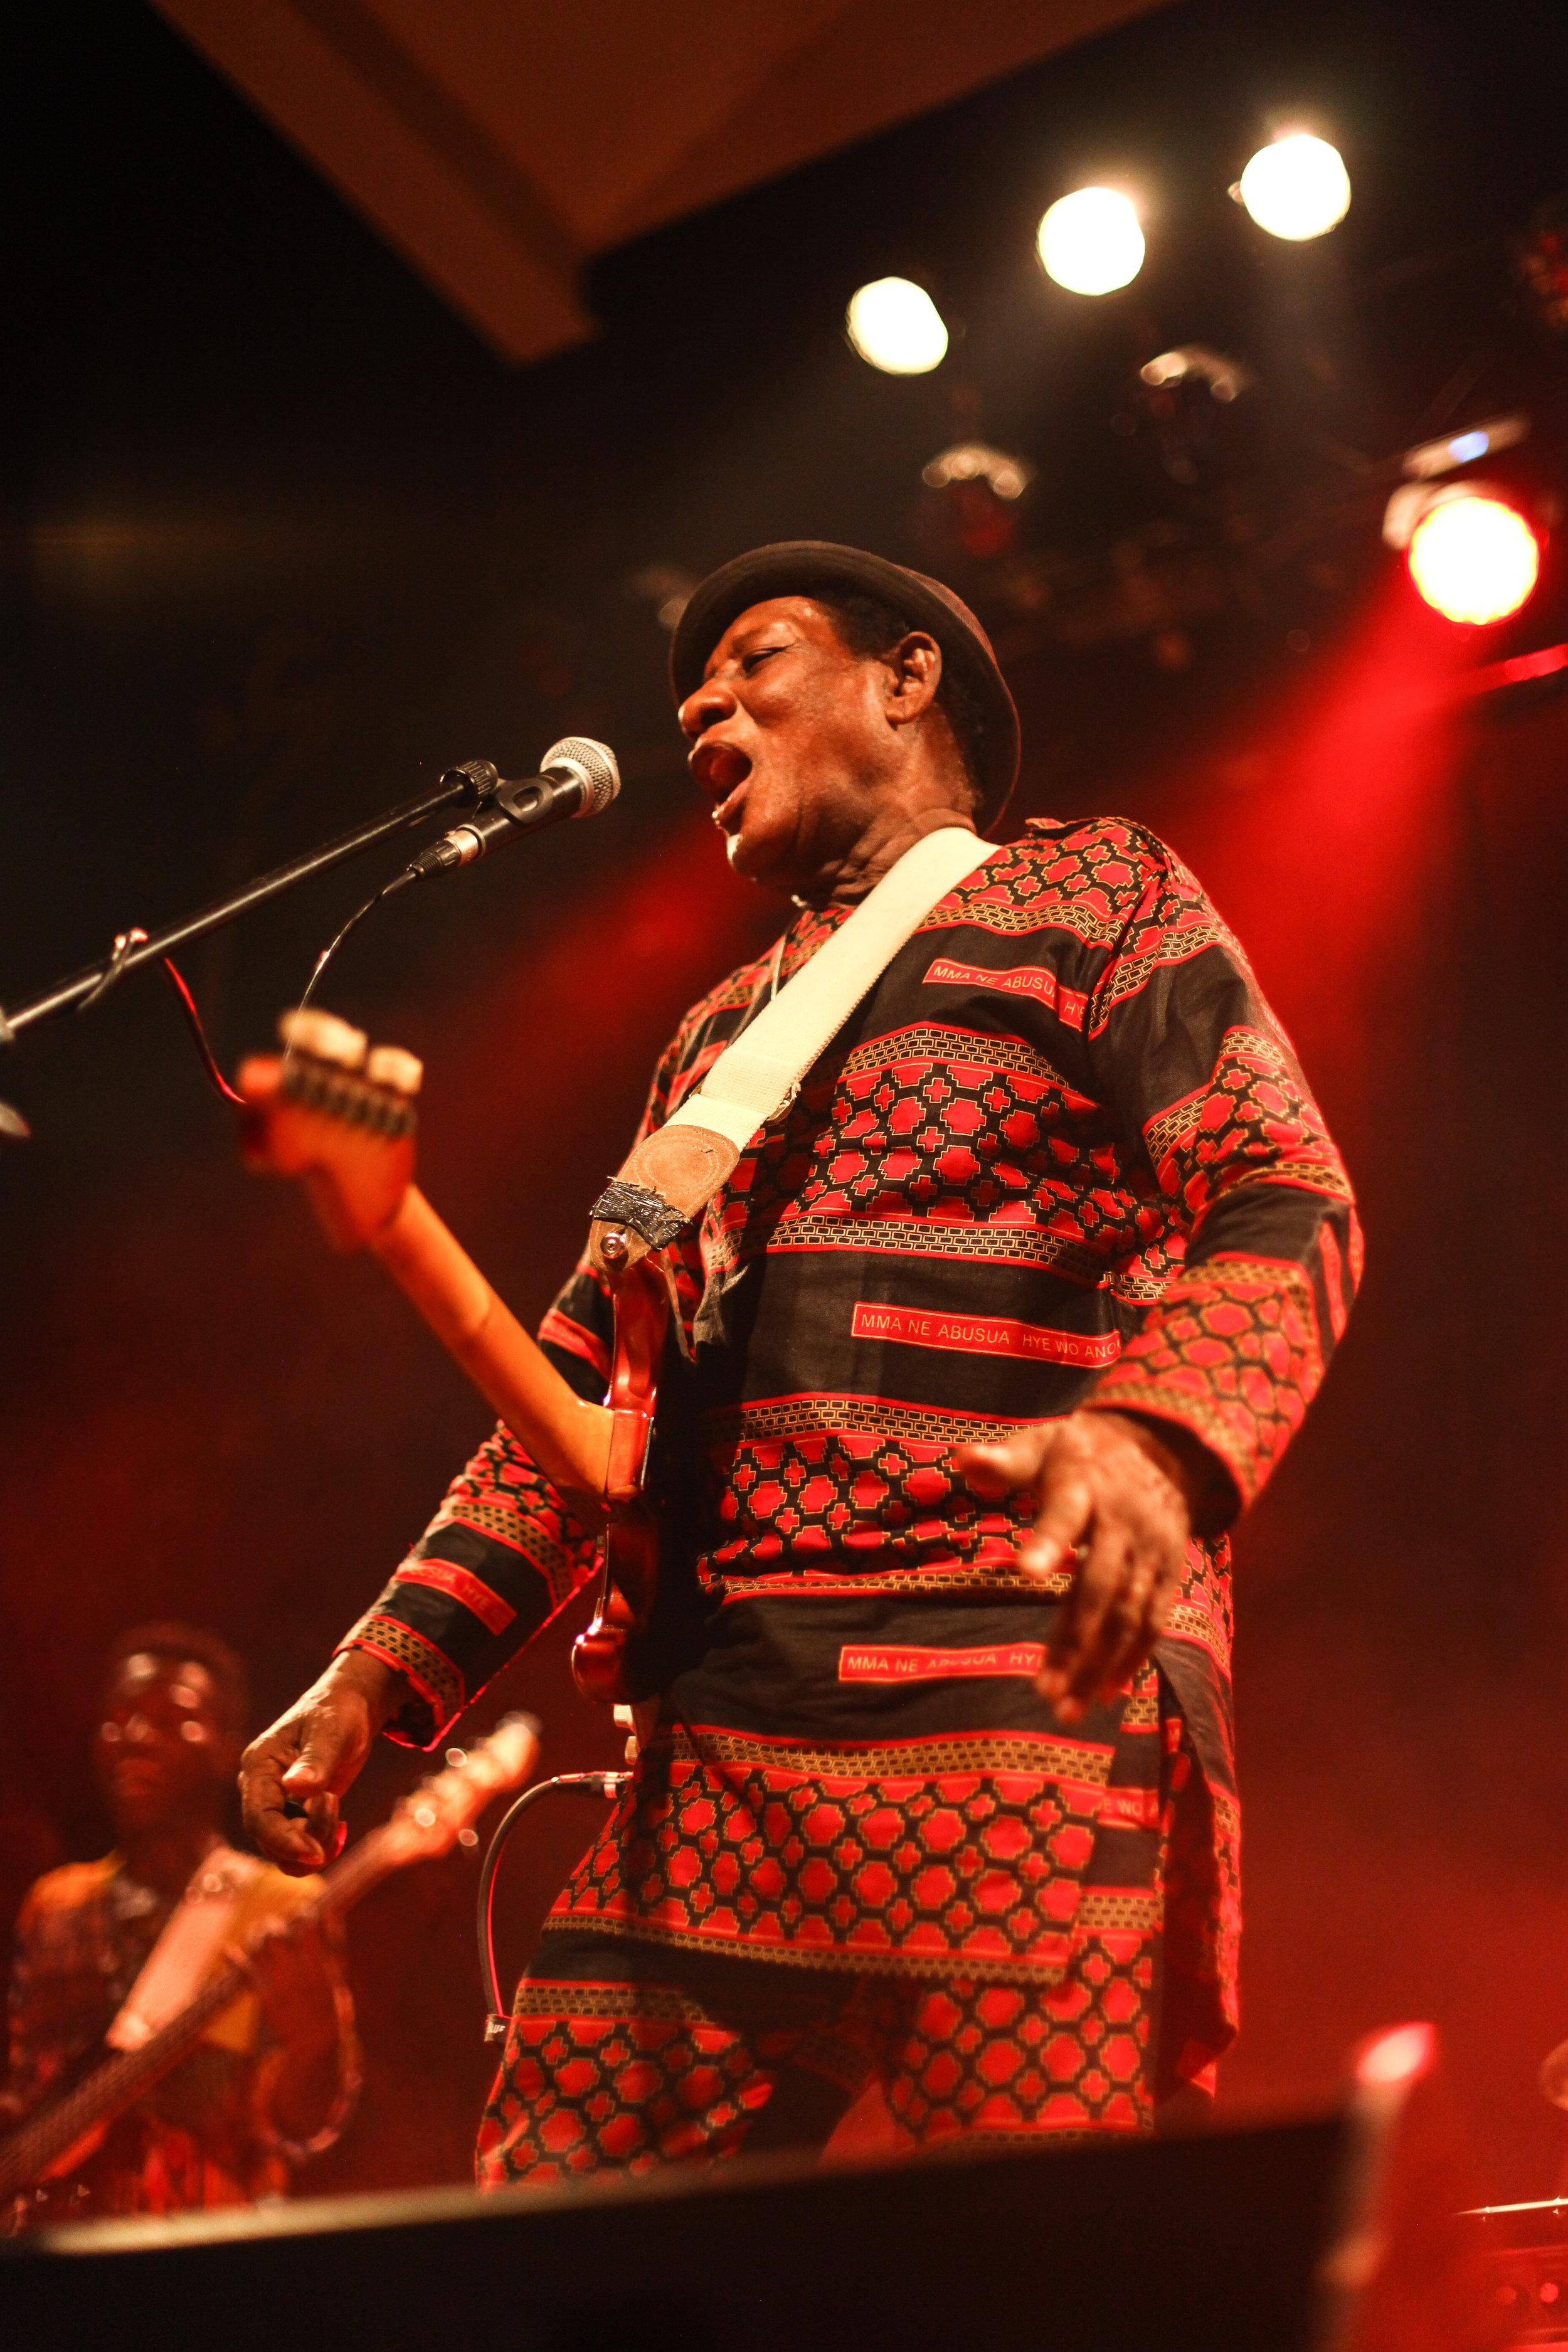 EboTaylor_AfricaAlive2017_MayaRoettger-30.jpg